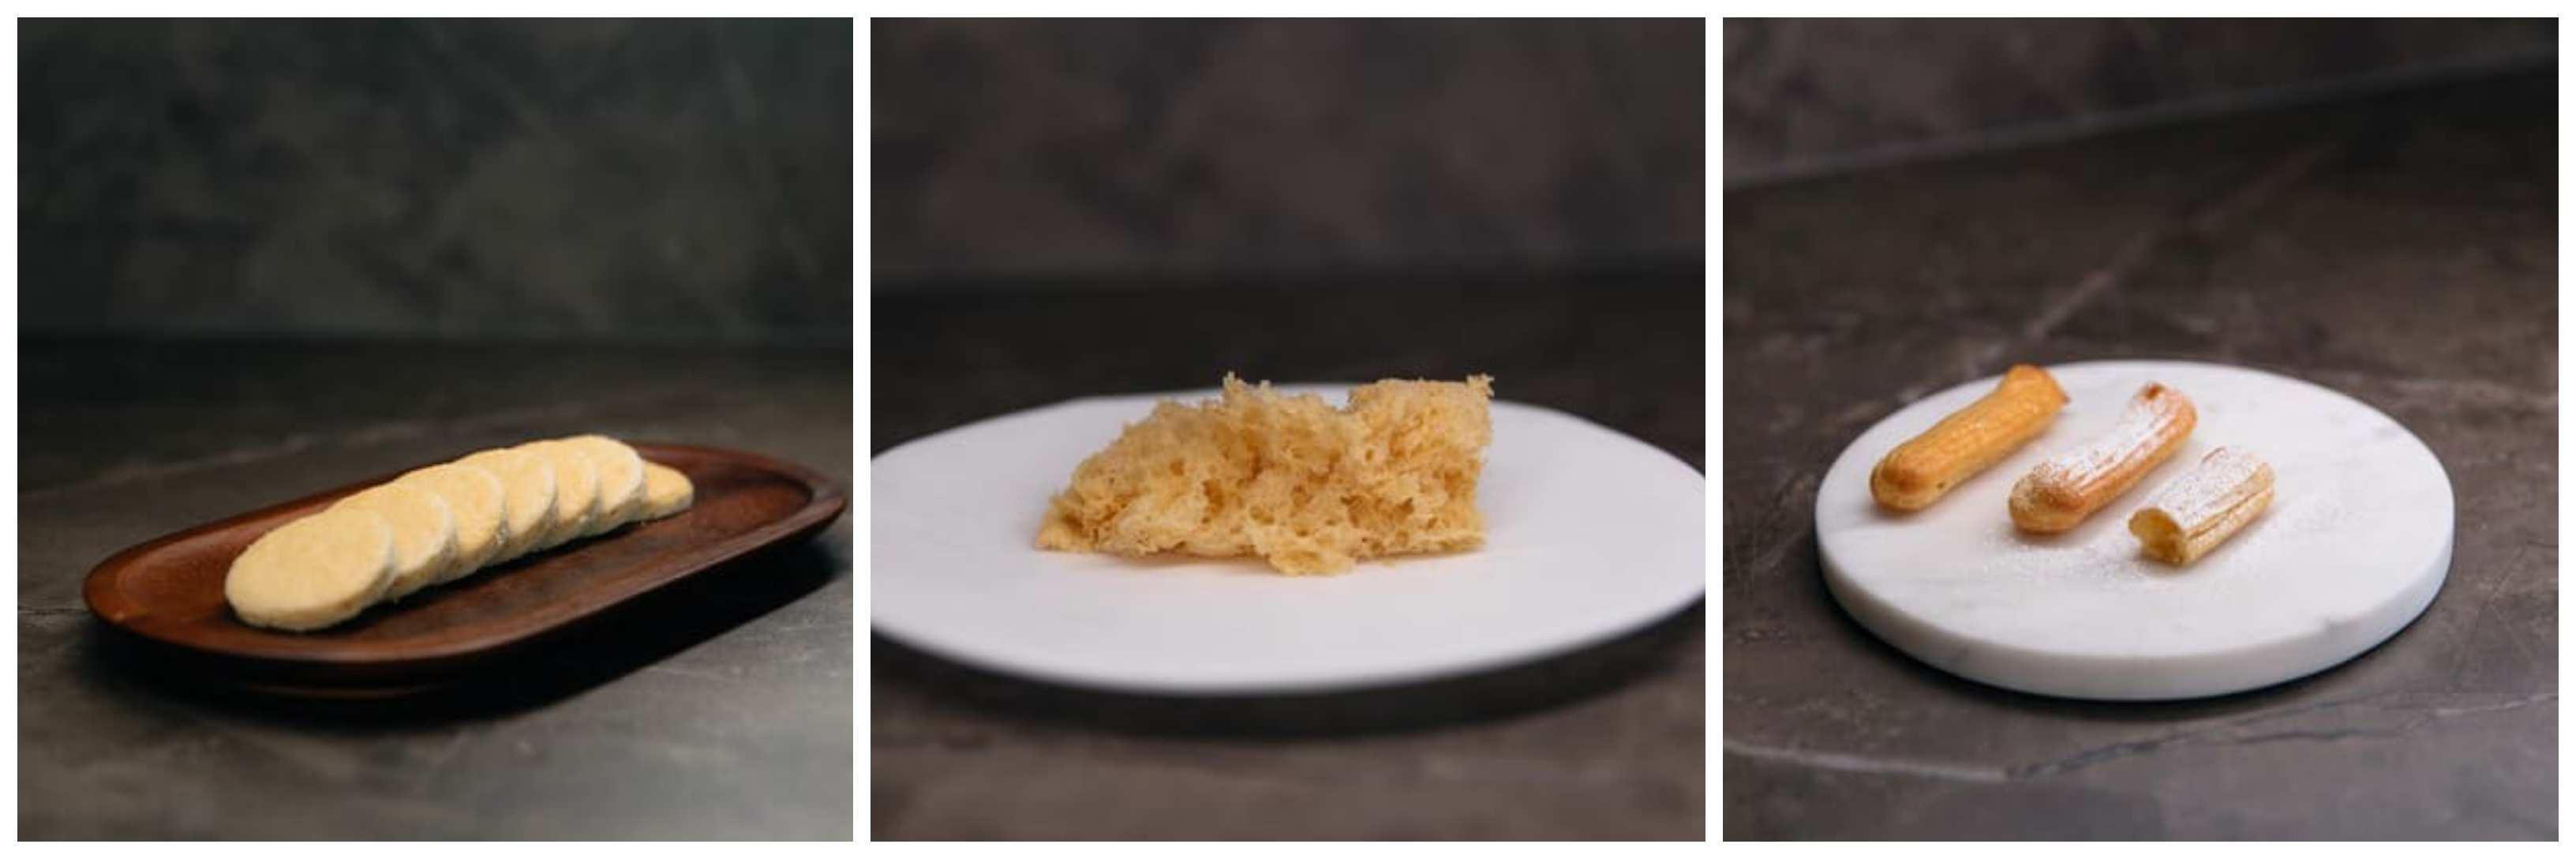 Platos realizados por la chef Begoña Rodrigo